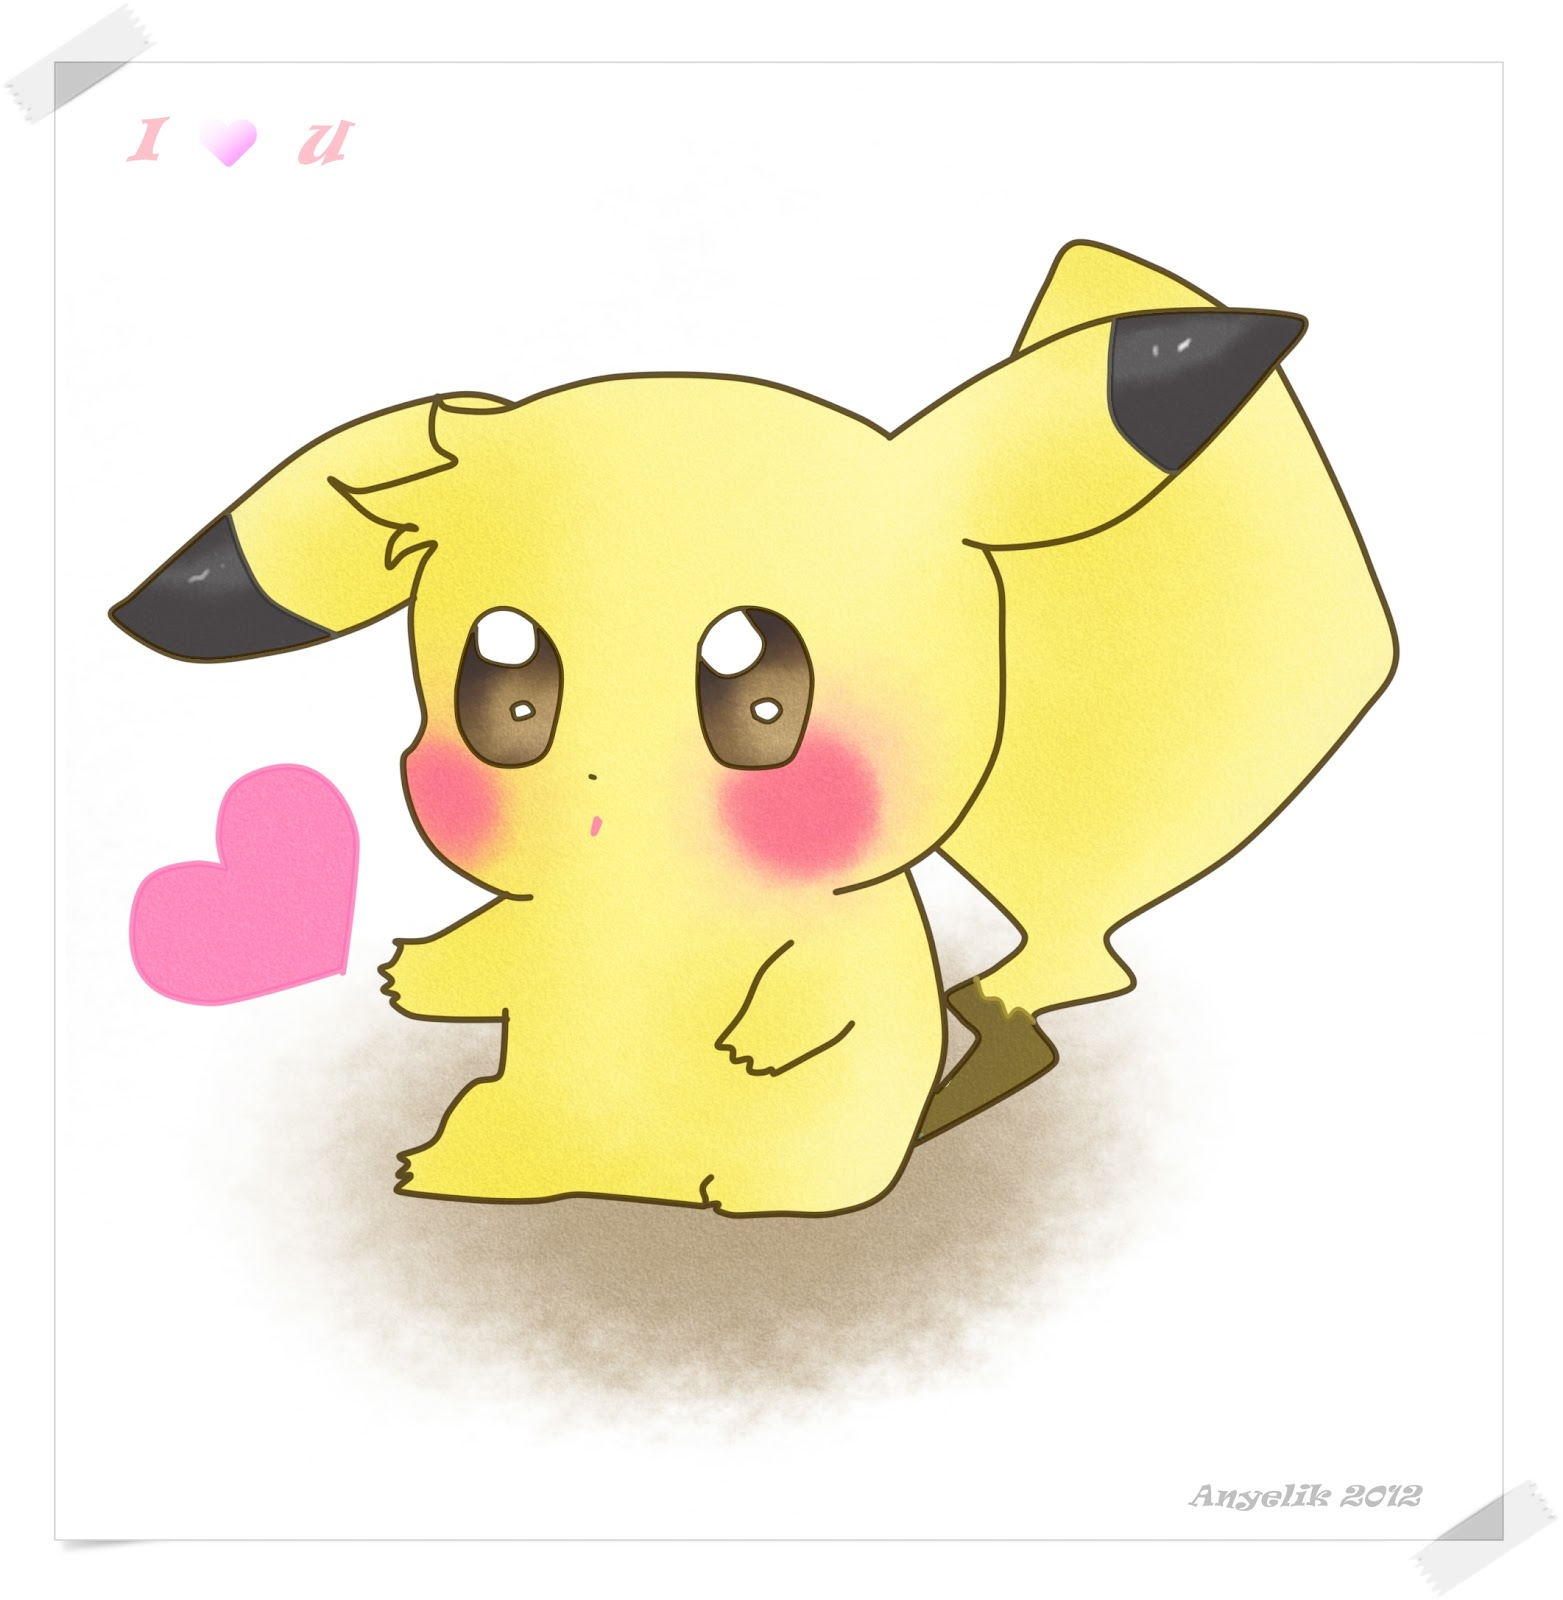 Mis dibujos y sentimientos mayo 2012 - Kawaii pikachu ...